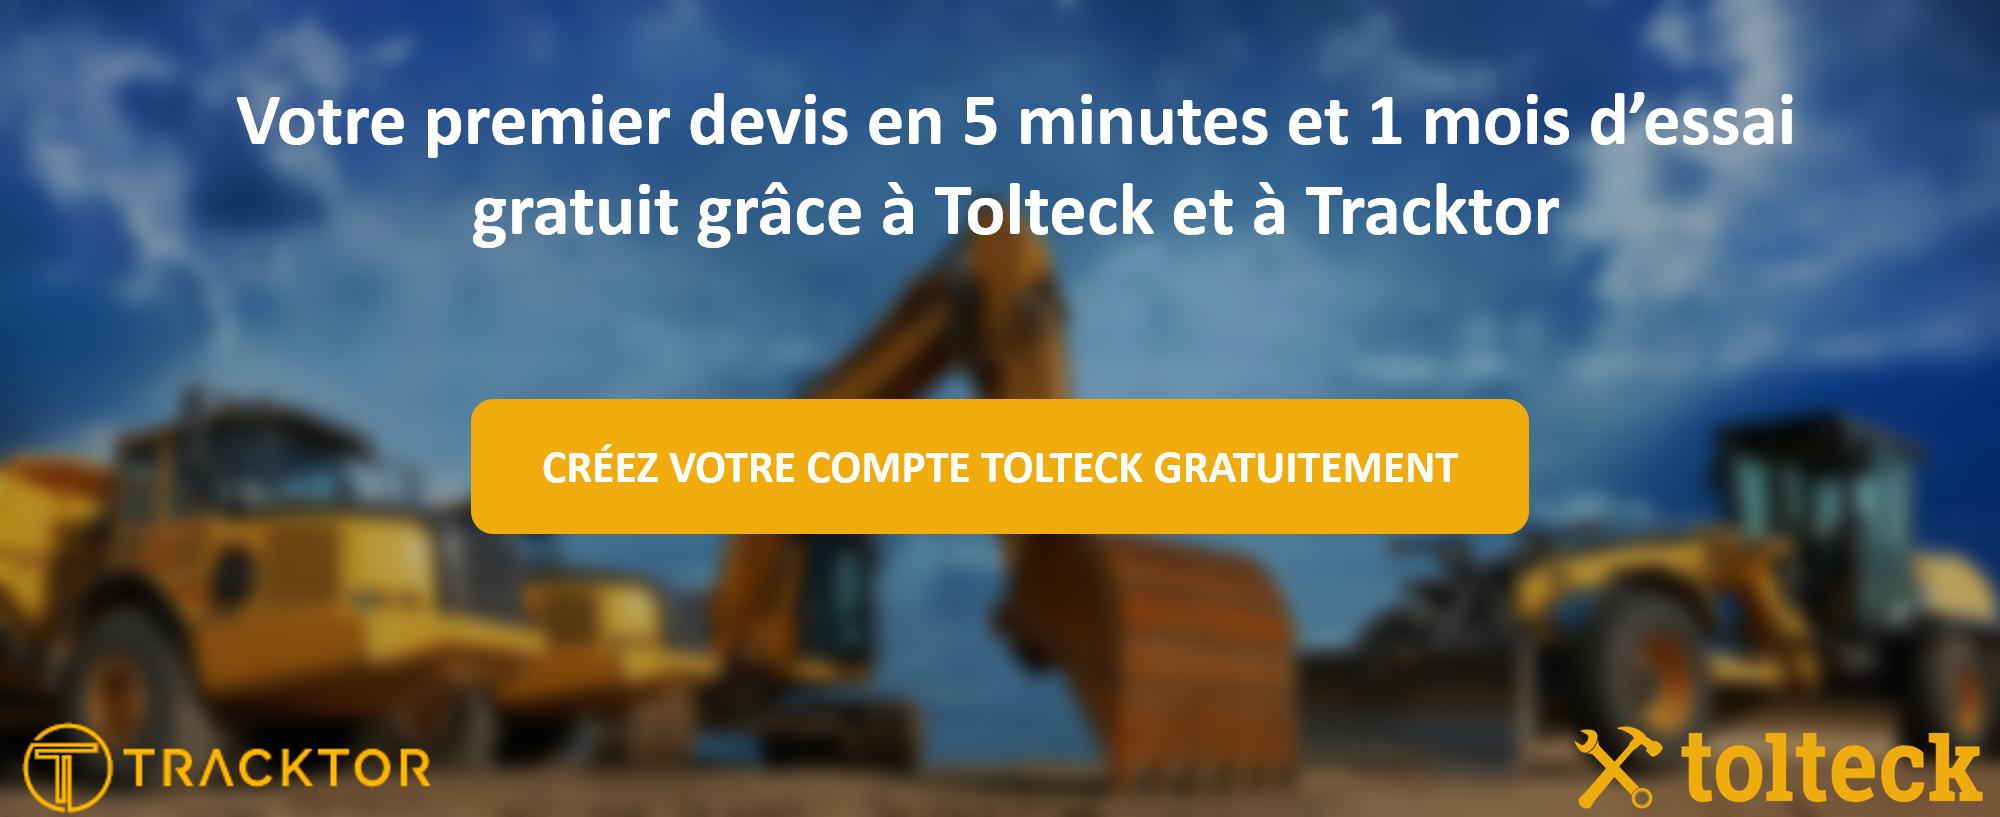 Tracktor Tolteck